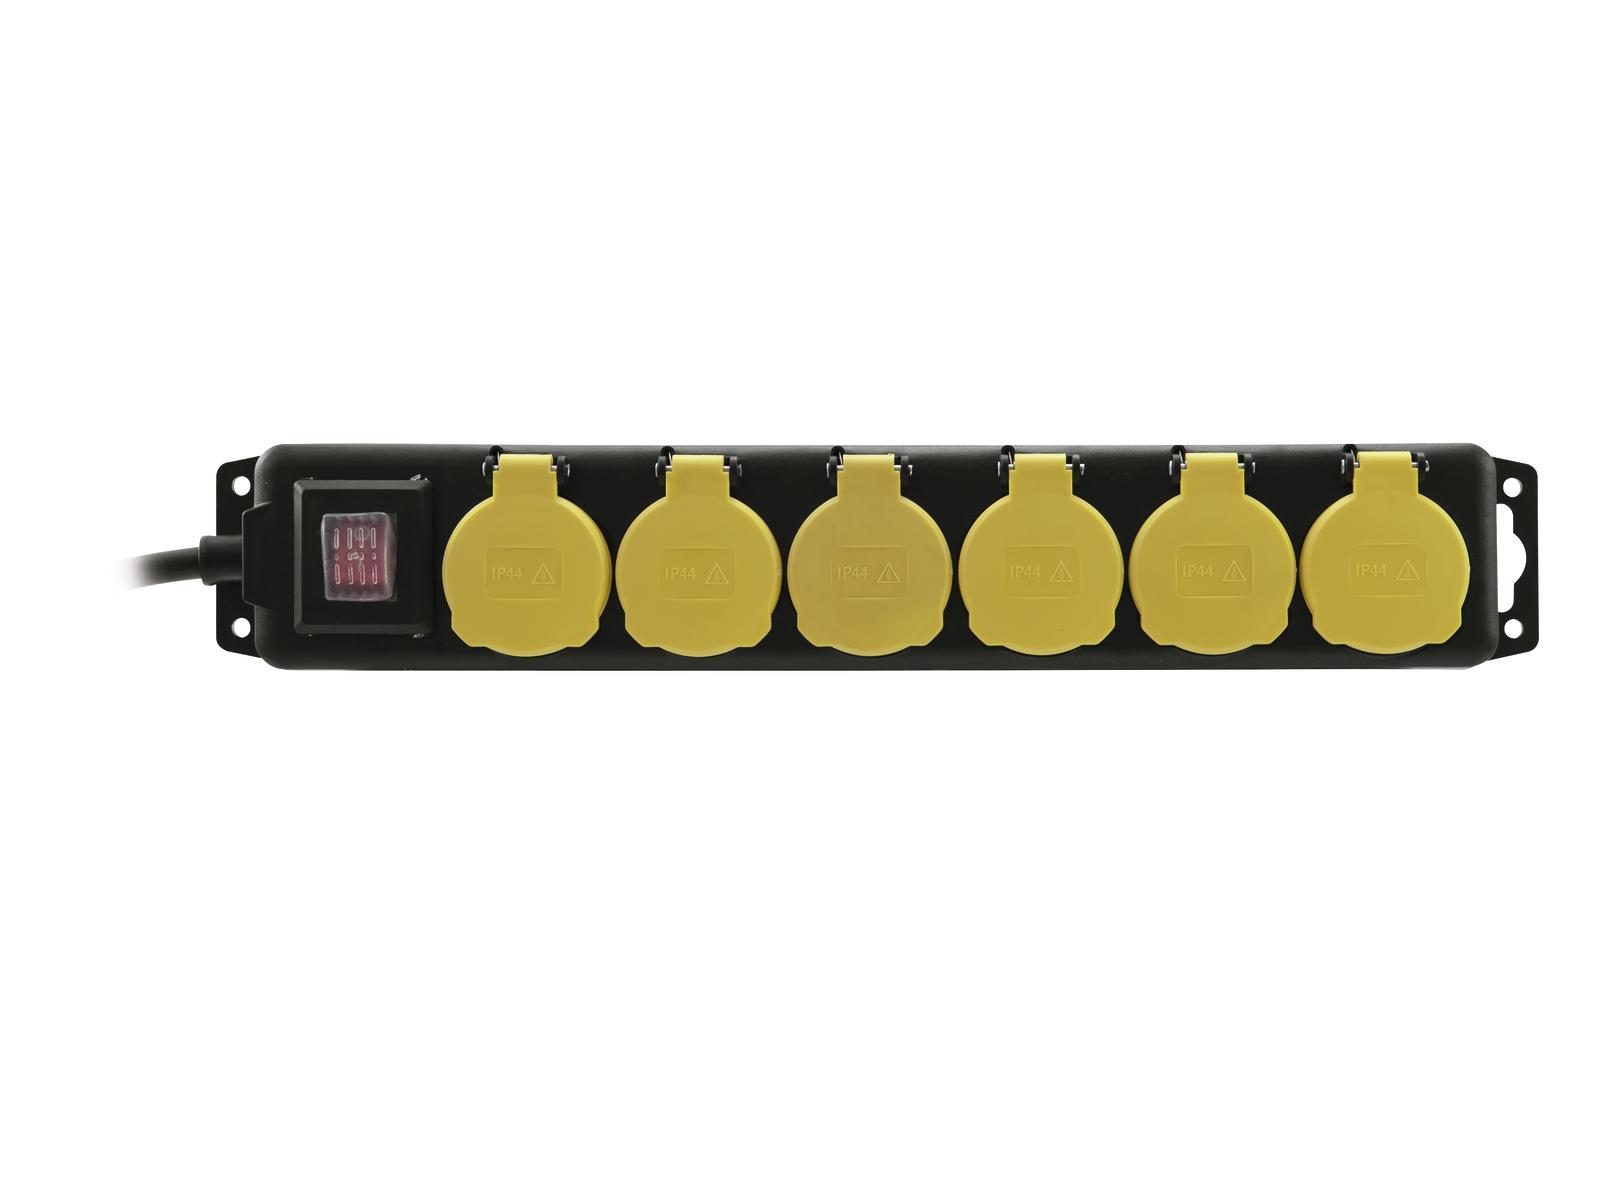 Power distributor EUROLITE with 6 sockets, 5M